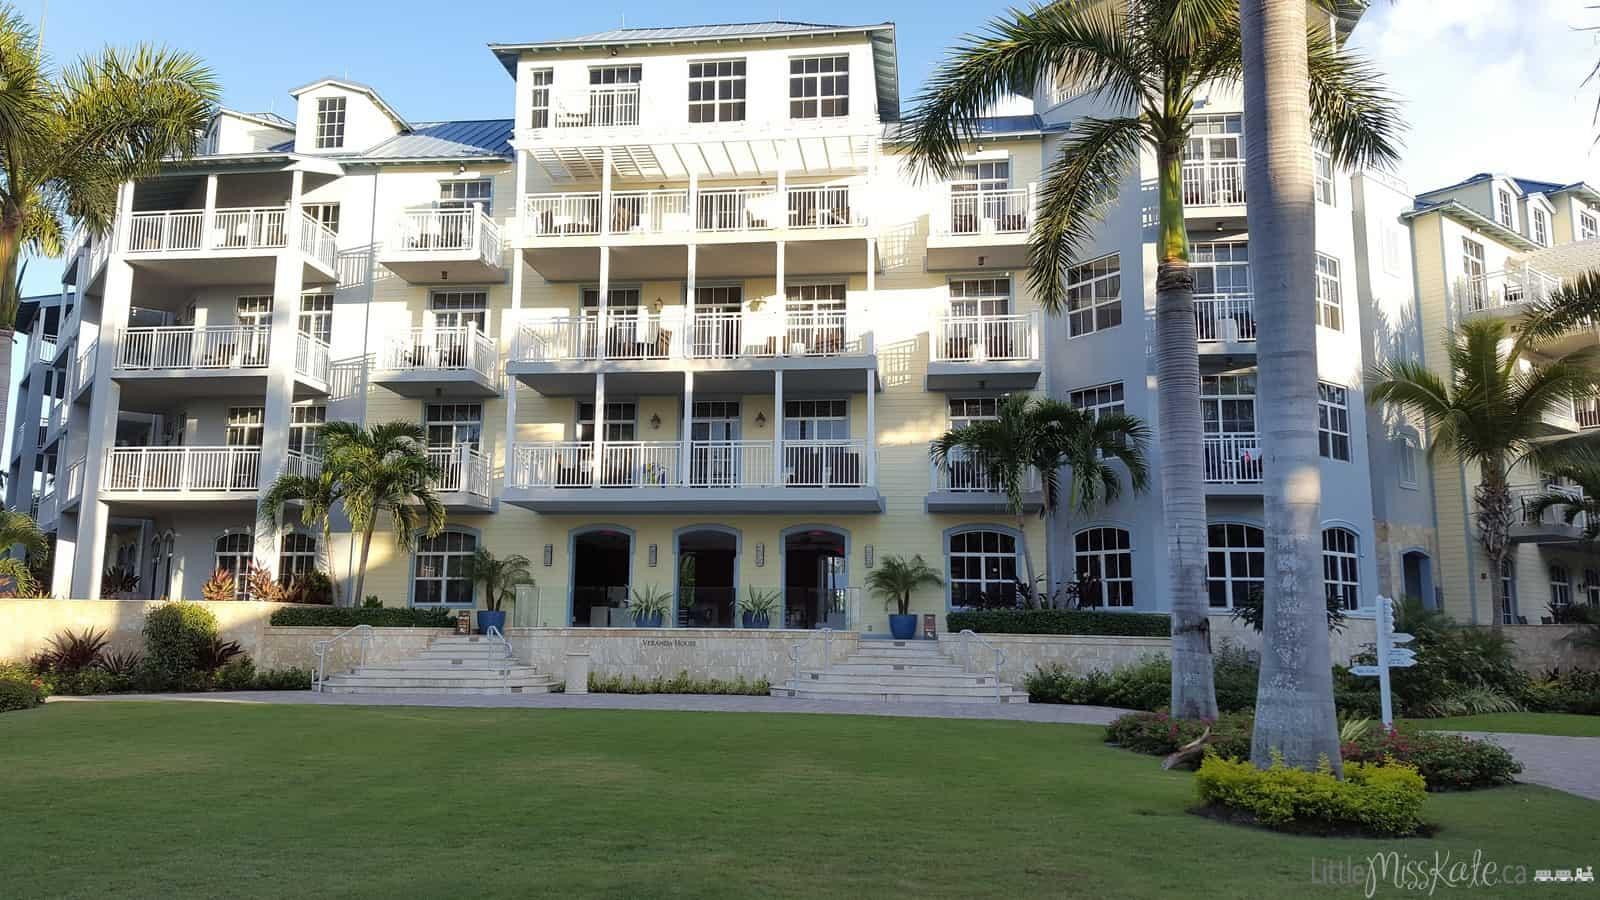 Beaches Resort Villages Key West Village 2 bedroom suite Turks and Caicos via www.littlemisskate.ca